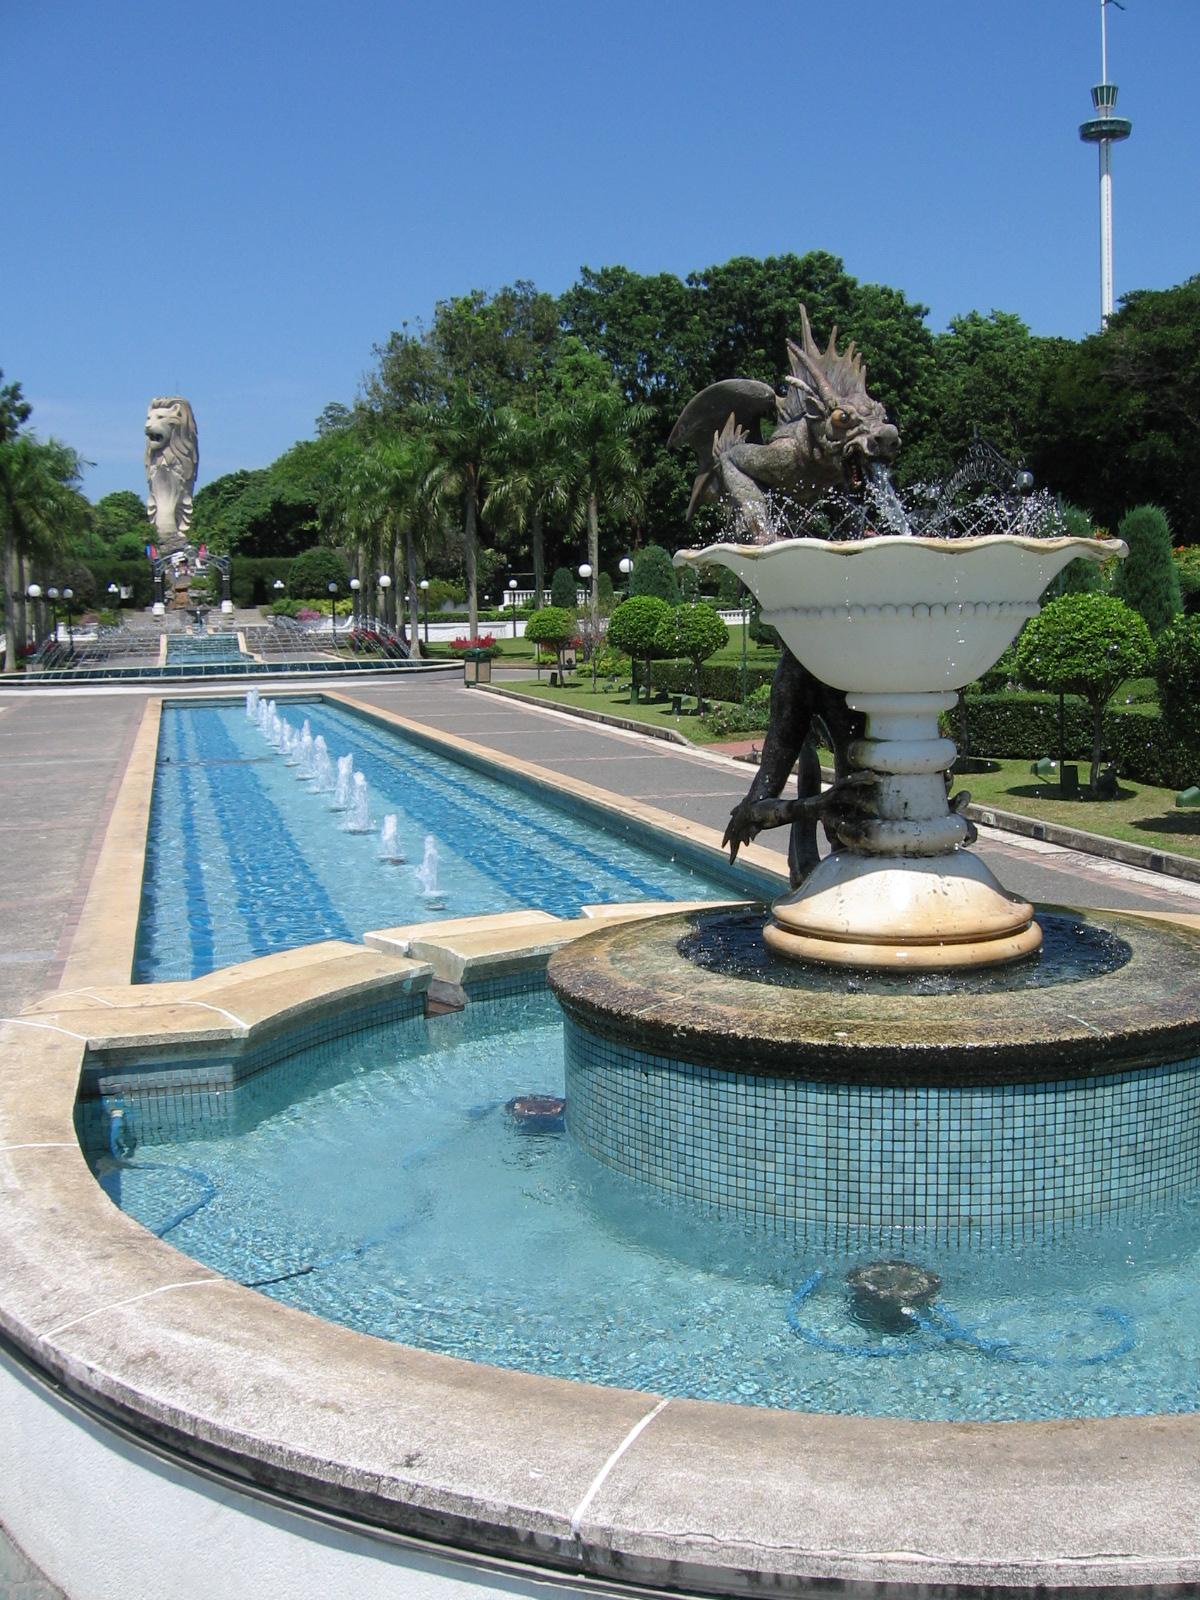 File Fountain Gardens 2 Sentosa Aug 06 Jpg Wikimedia